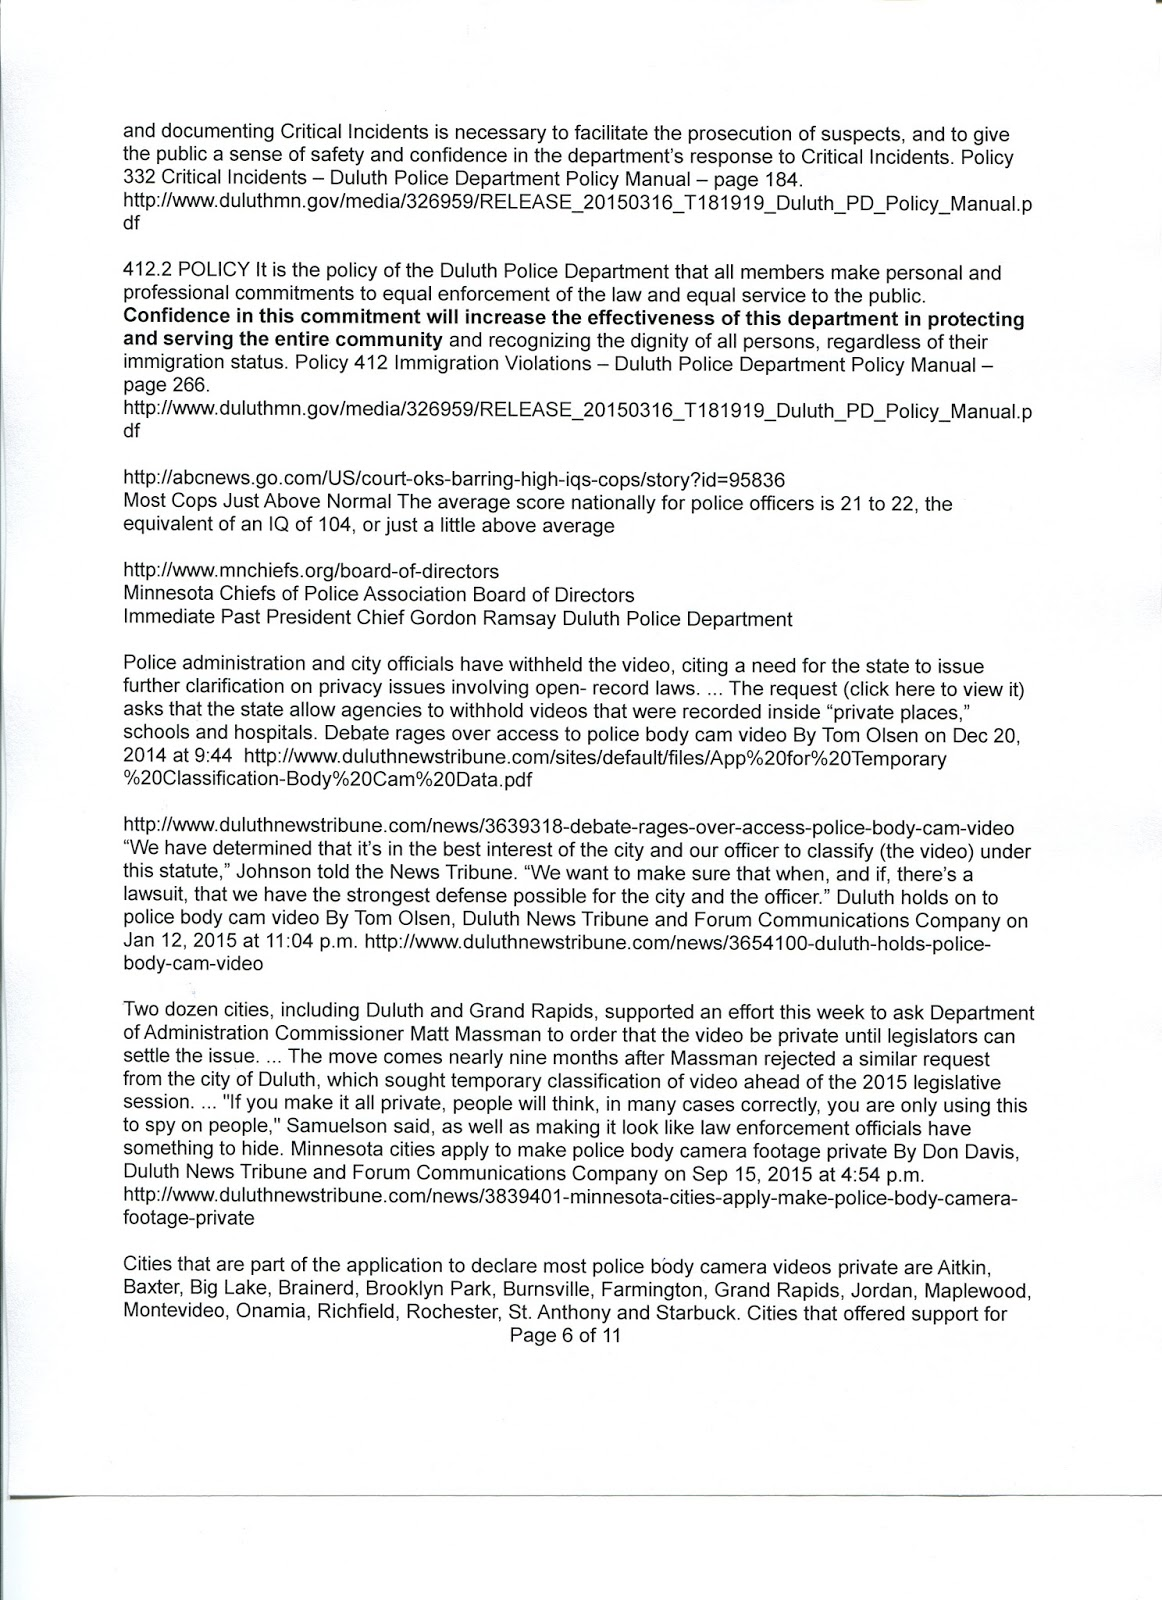 personal response essay response essay format response essay  critical response essay format sample resume skills profile critical response essay format neurology nurse sample resume